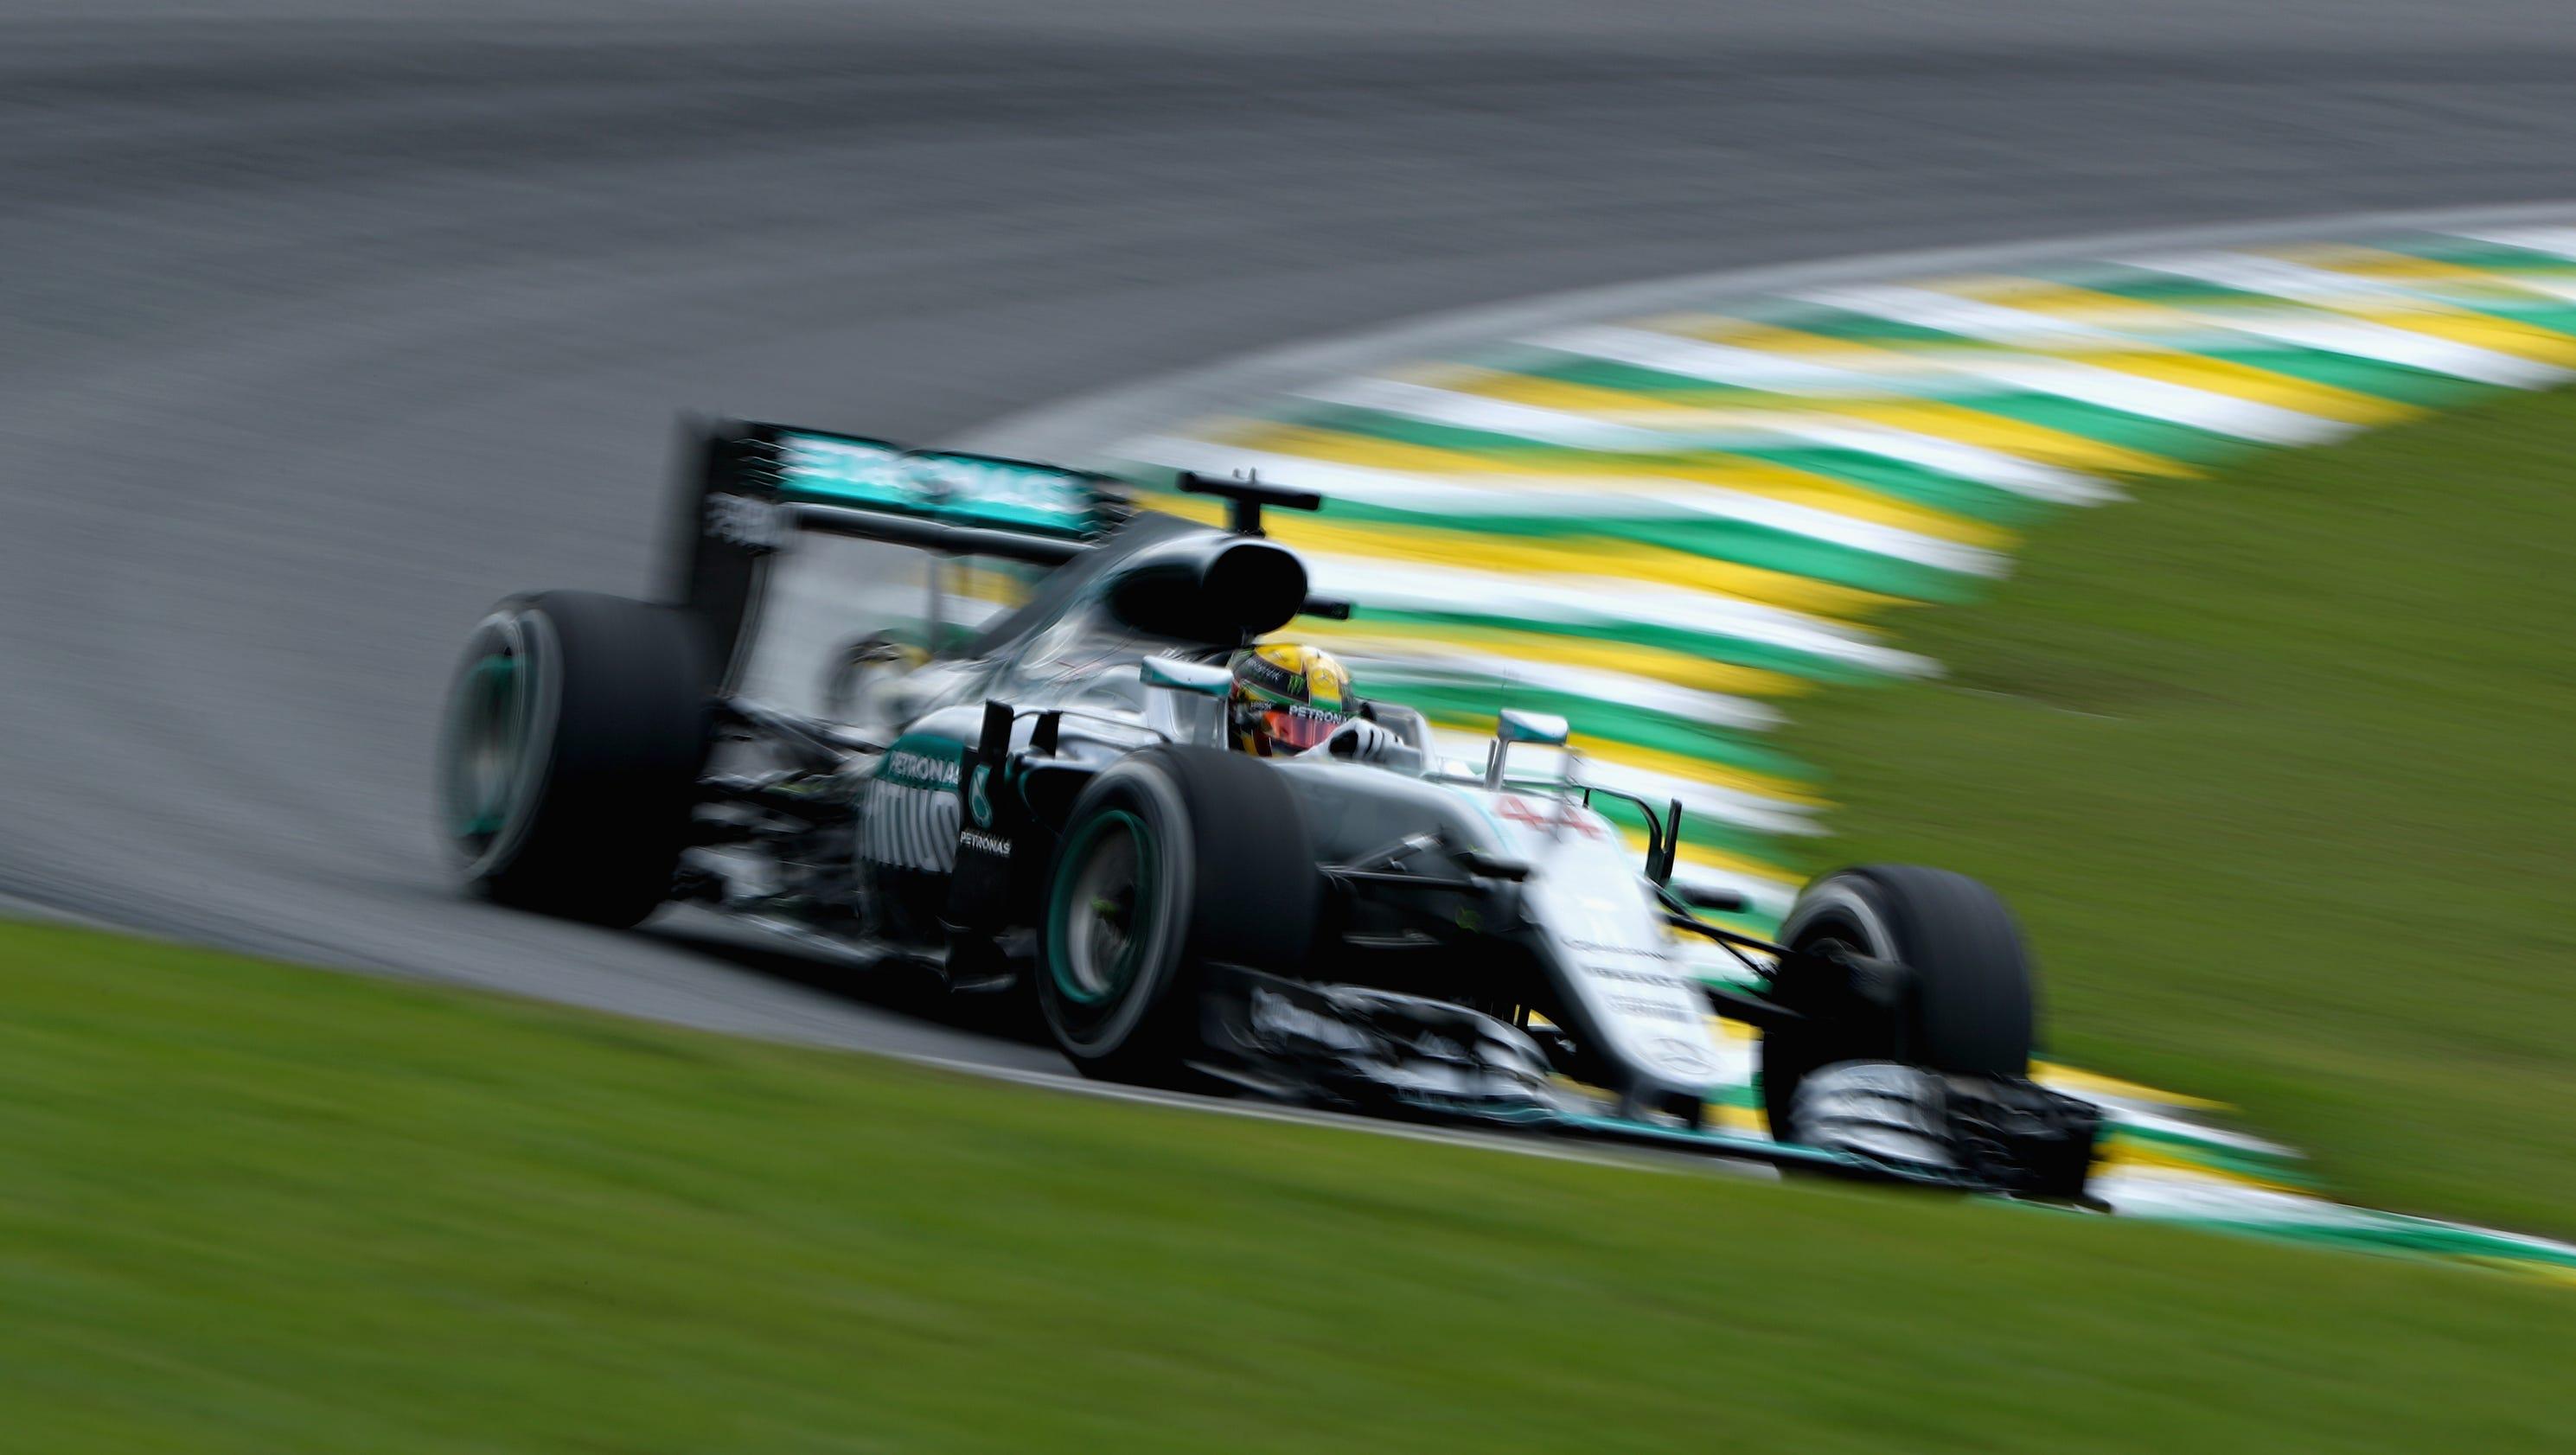 Lewis Hamilton has edge on Nico Rosberg in Brazilian GP ...